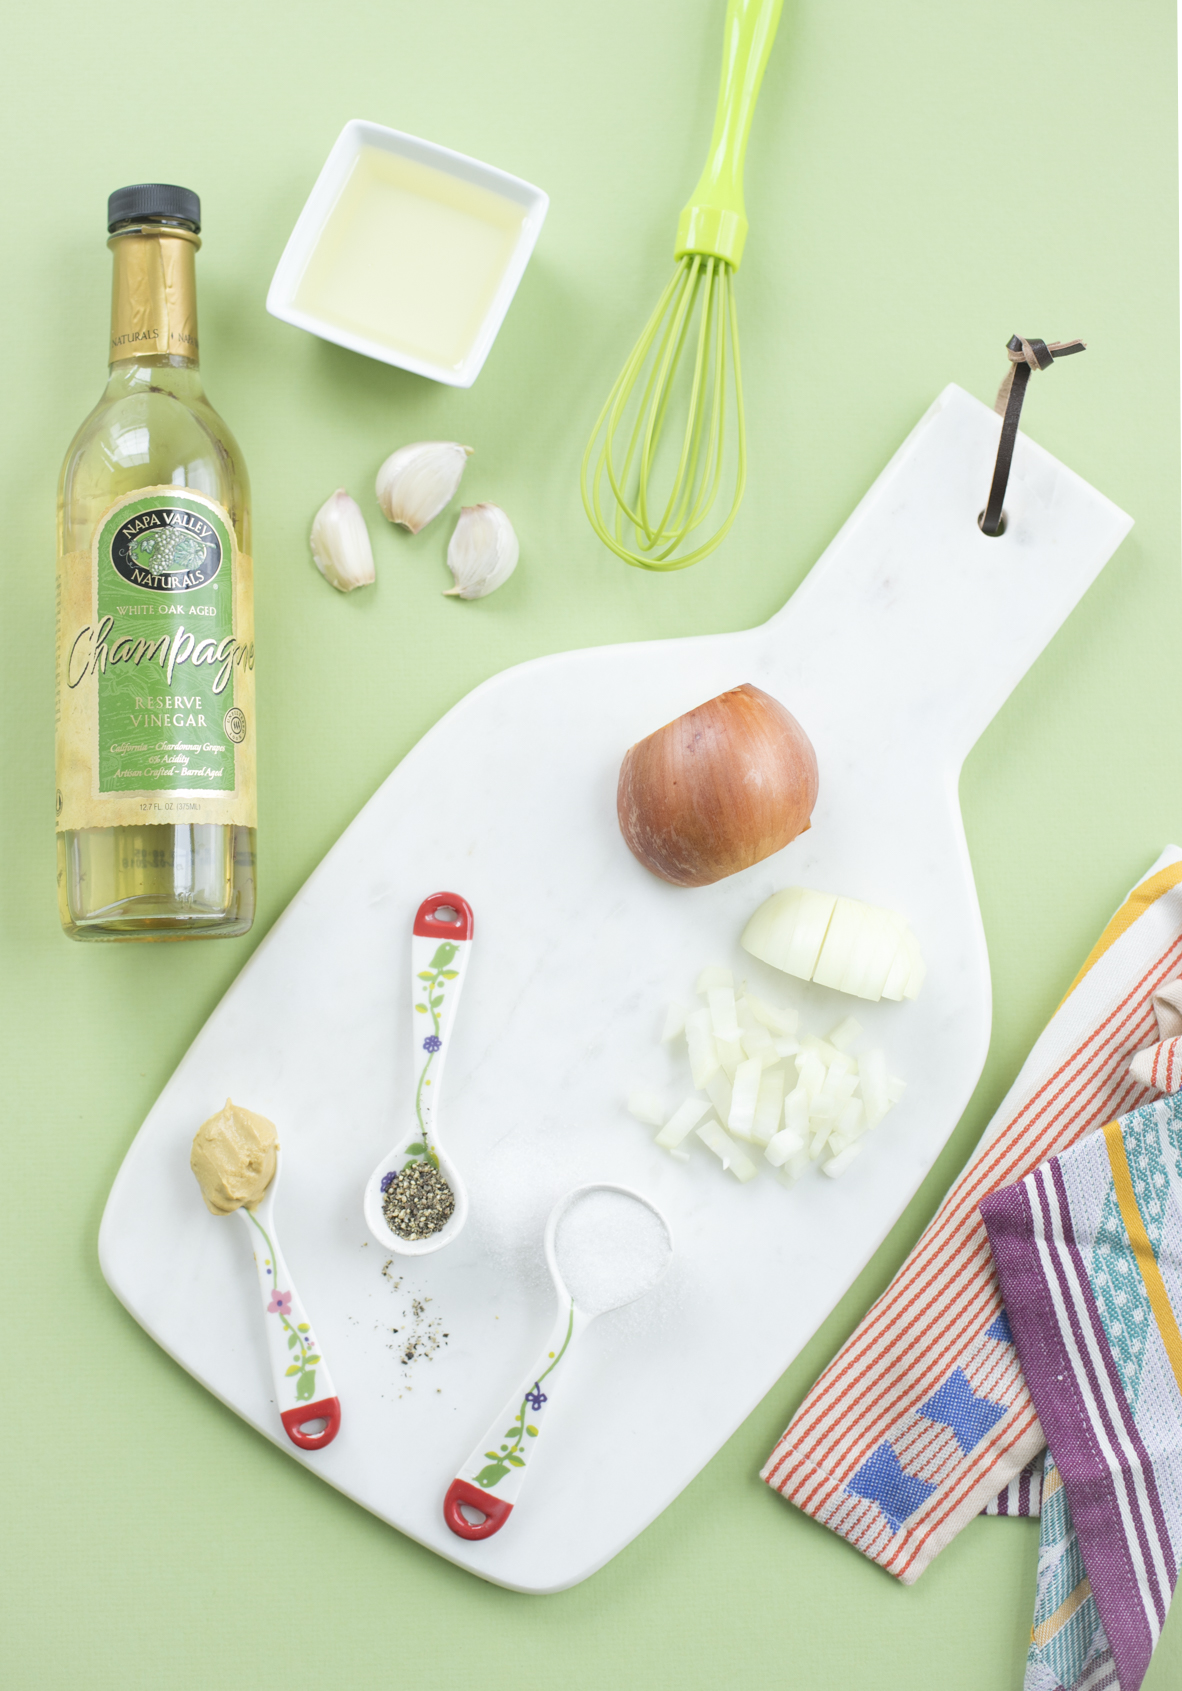 Champagne Vinaigrette Recipe